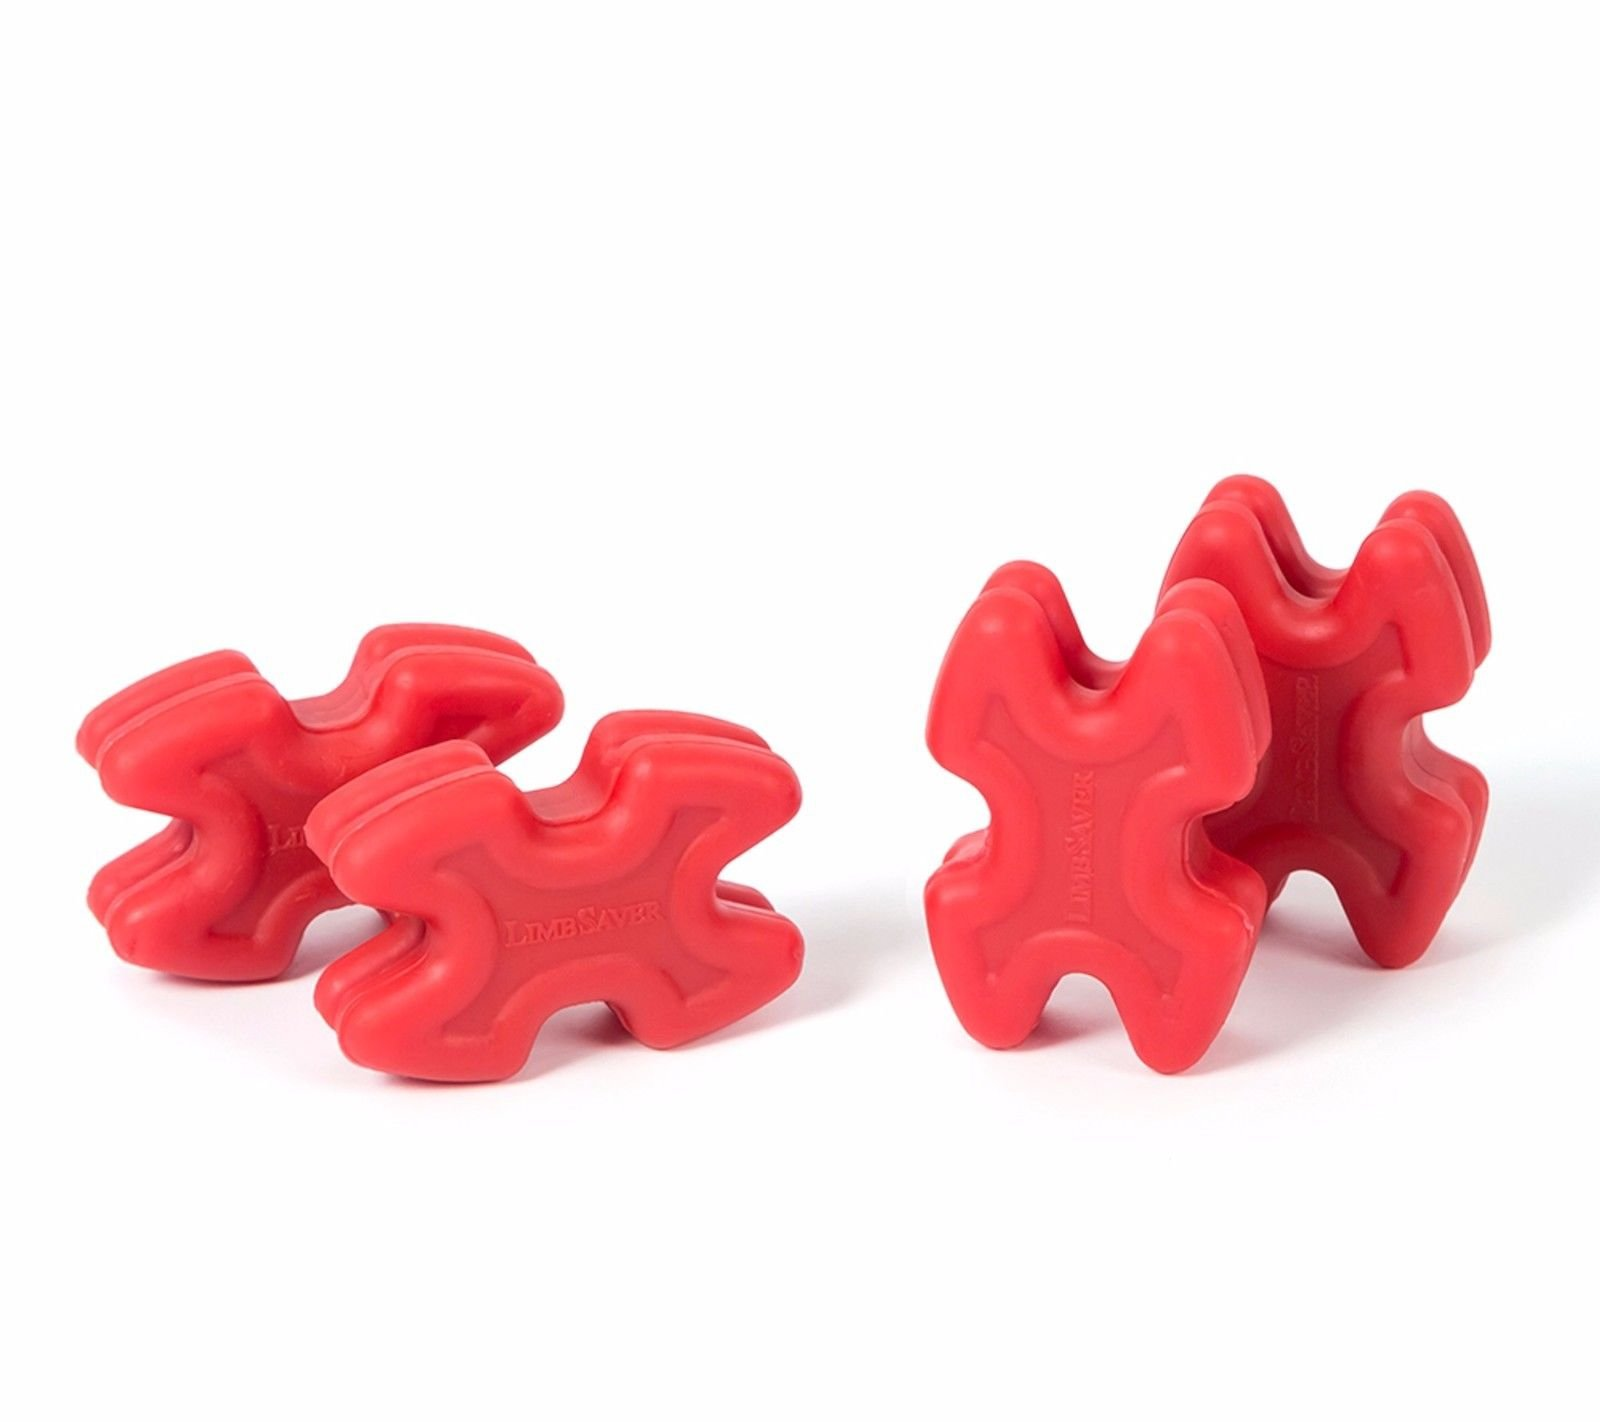 LimbSaver 4726 TwistLox Dampener for Split Limb Bows, Red